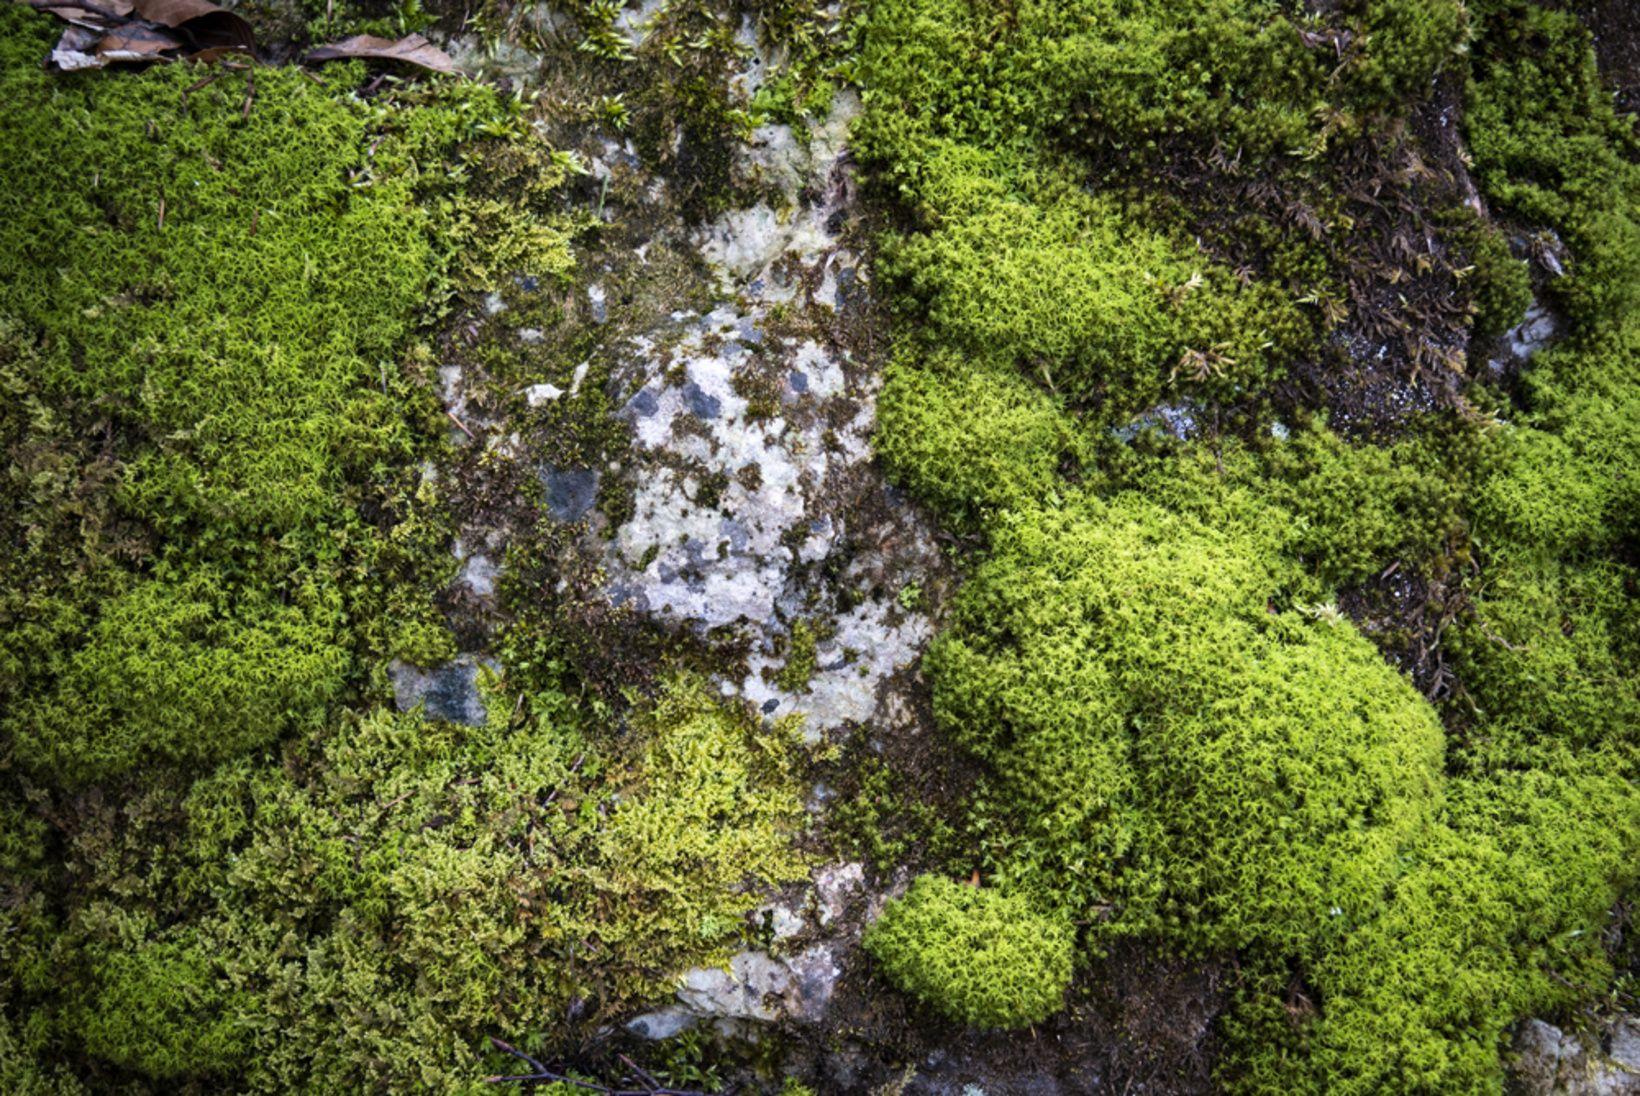 Moos Makro Blumen Altmuhltal 12apostel Bavaria Bayern Panoramaweg Wandern Natur Nature Urdonau Entspannung Landschaft Instagood Picoftheda Plants